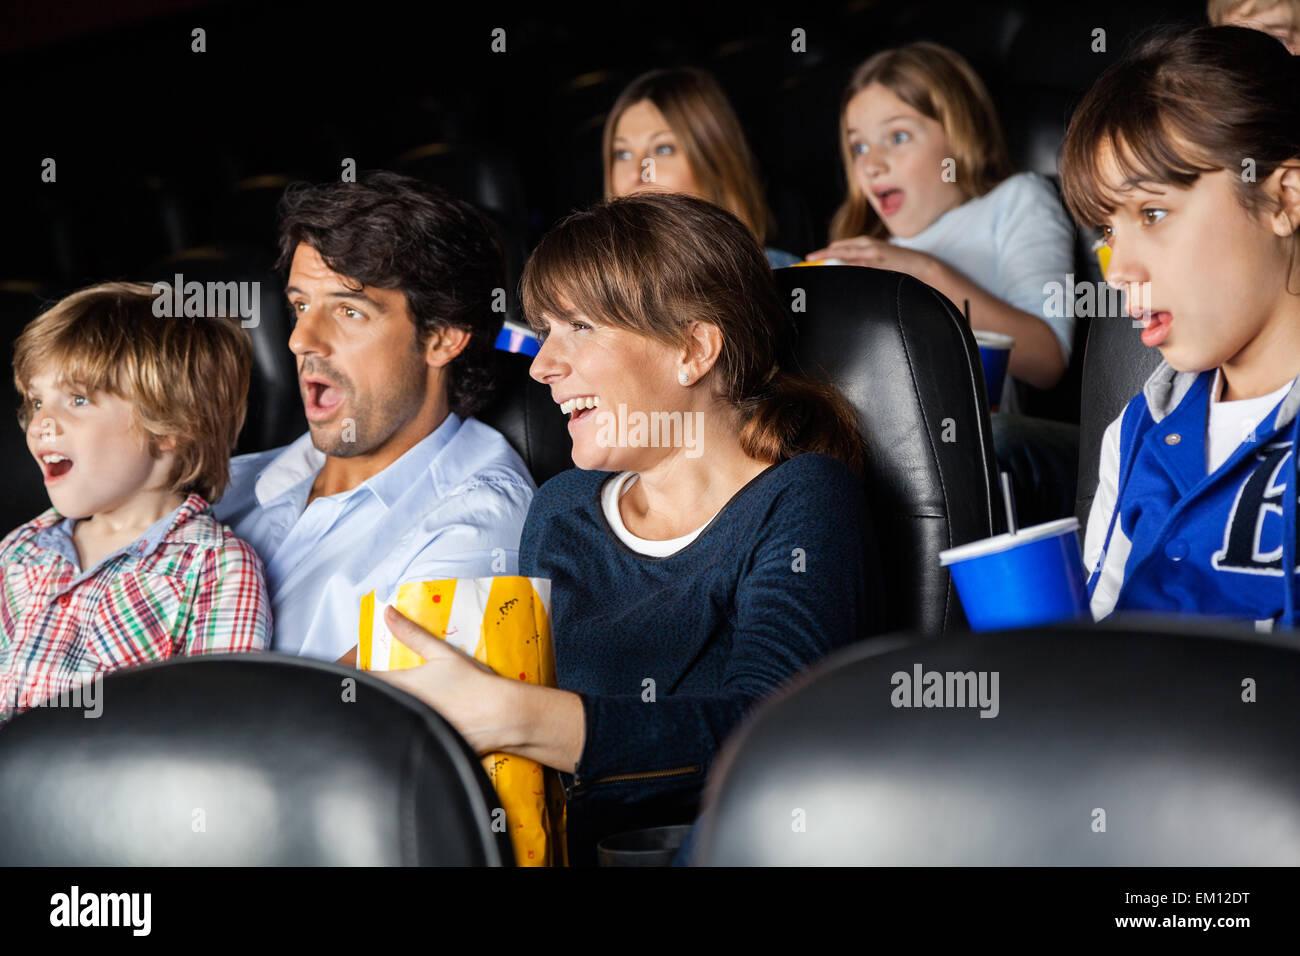 Amazed Families Watching Movie - Stock Image